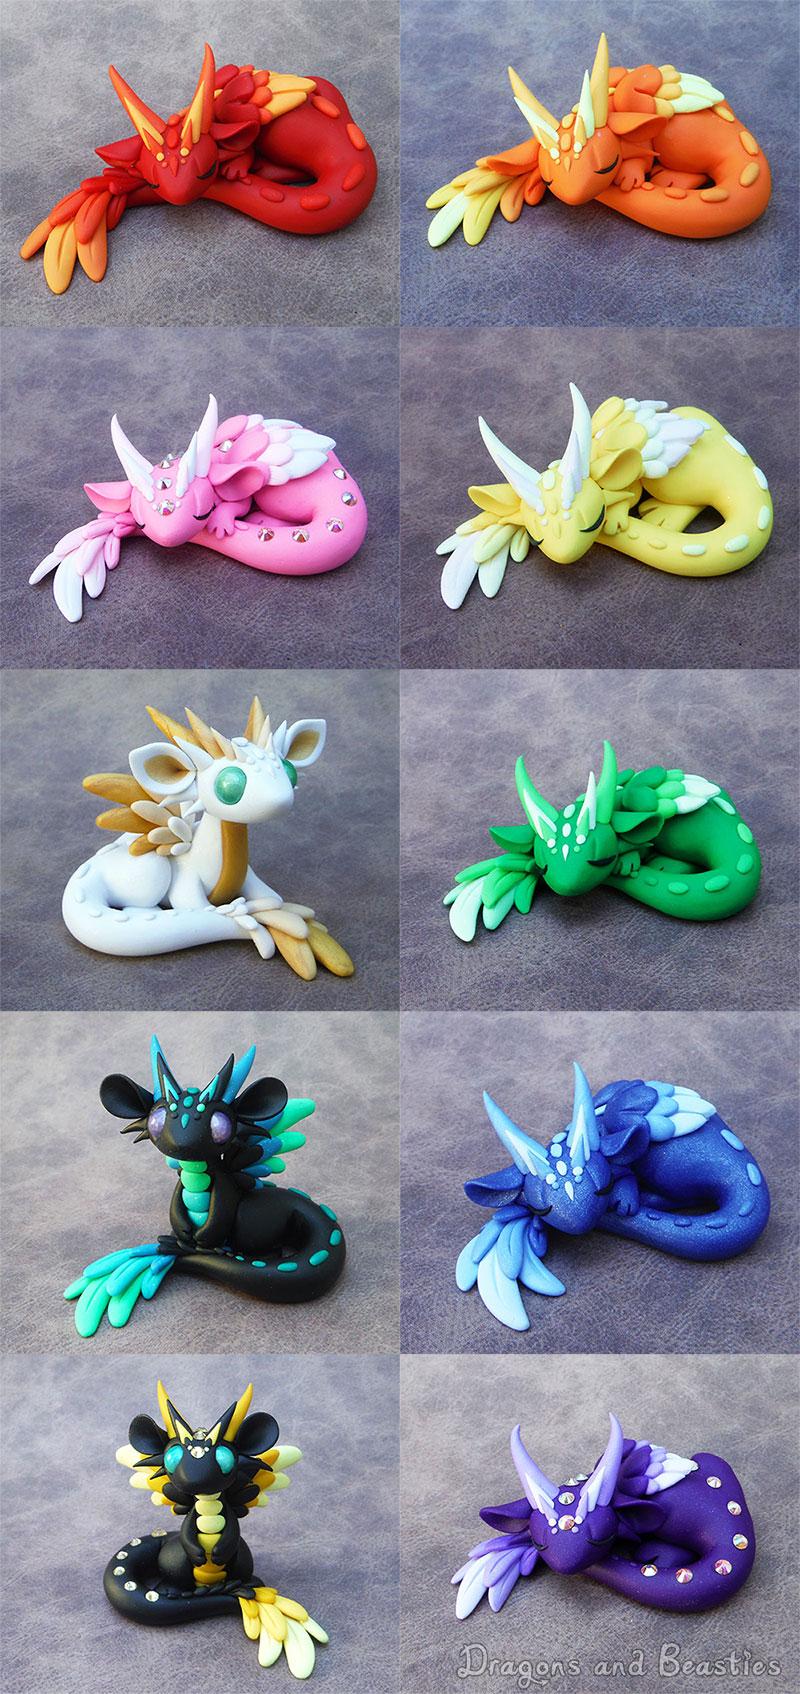 Angel Dragon: Angel Dragon Sale March 28 By DragonsAndBeasties On DeviantArt